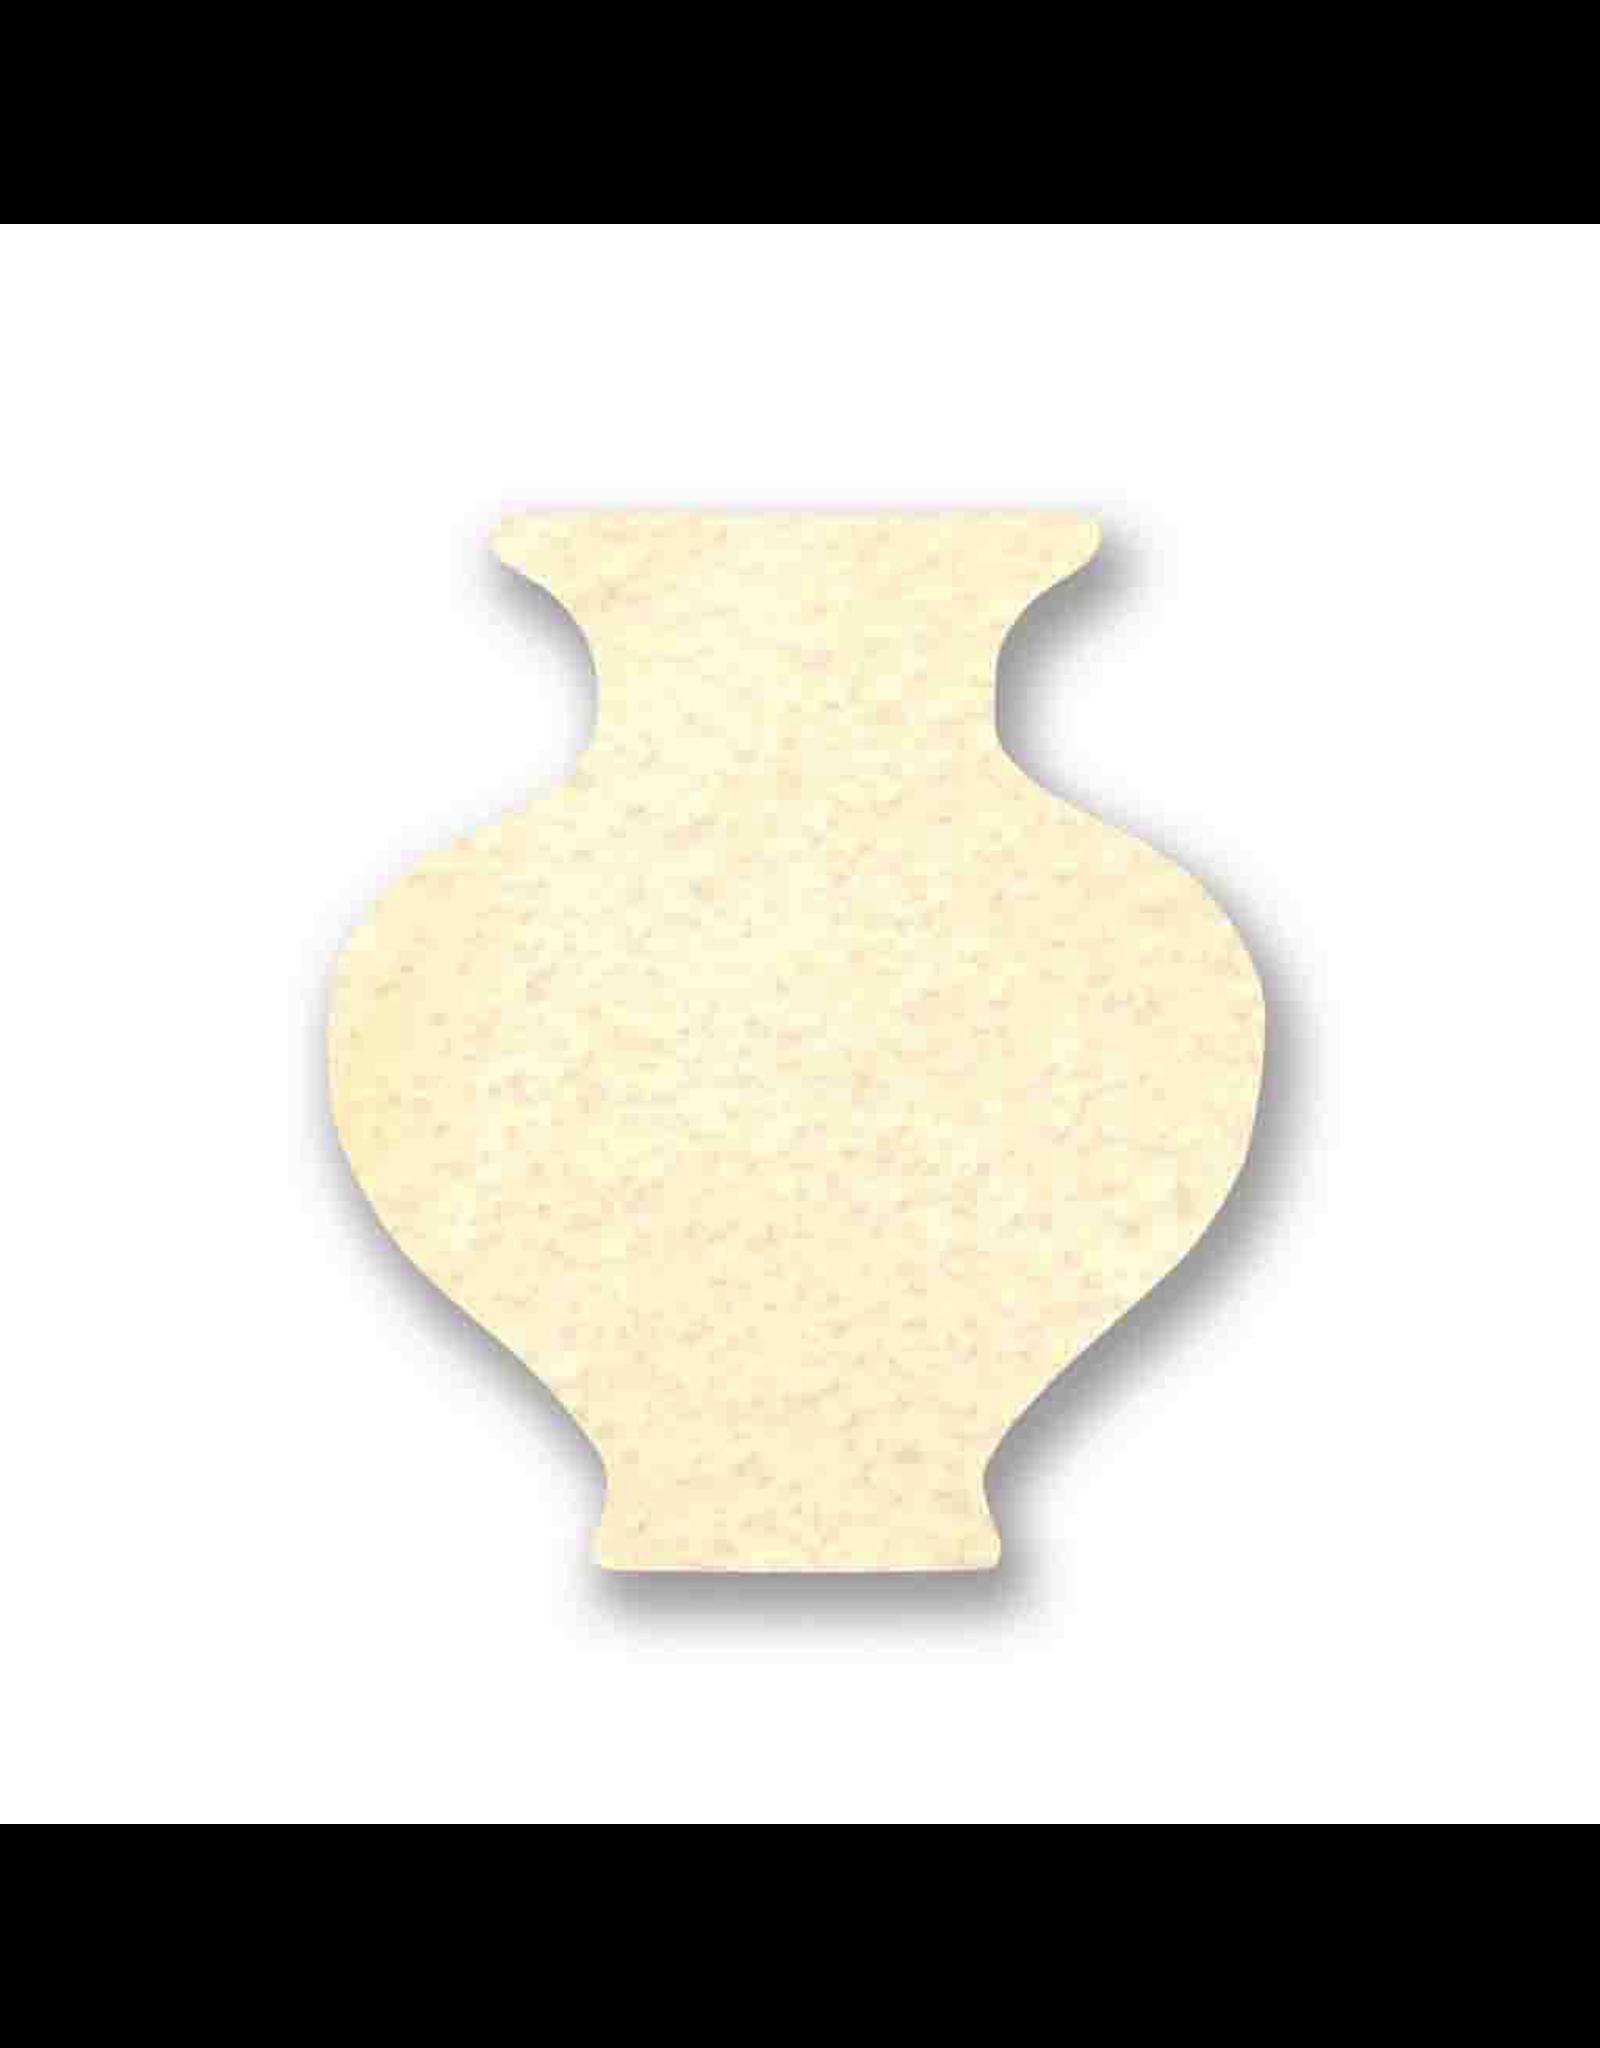 Scarva Scarva Proffessional White stoneware grogged 1120°c - 1280°c 12.5kg